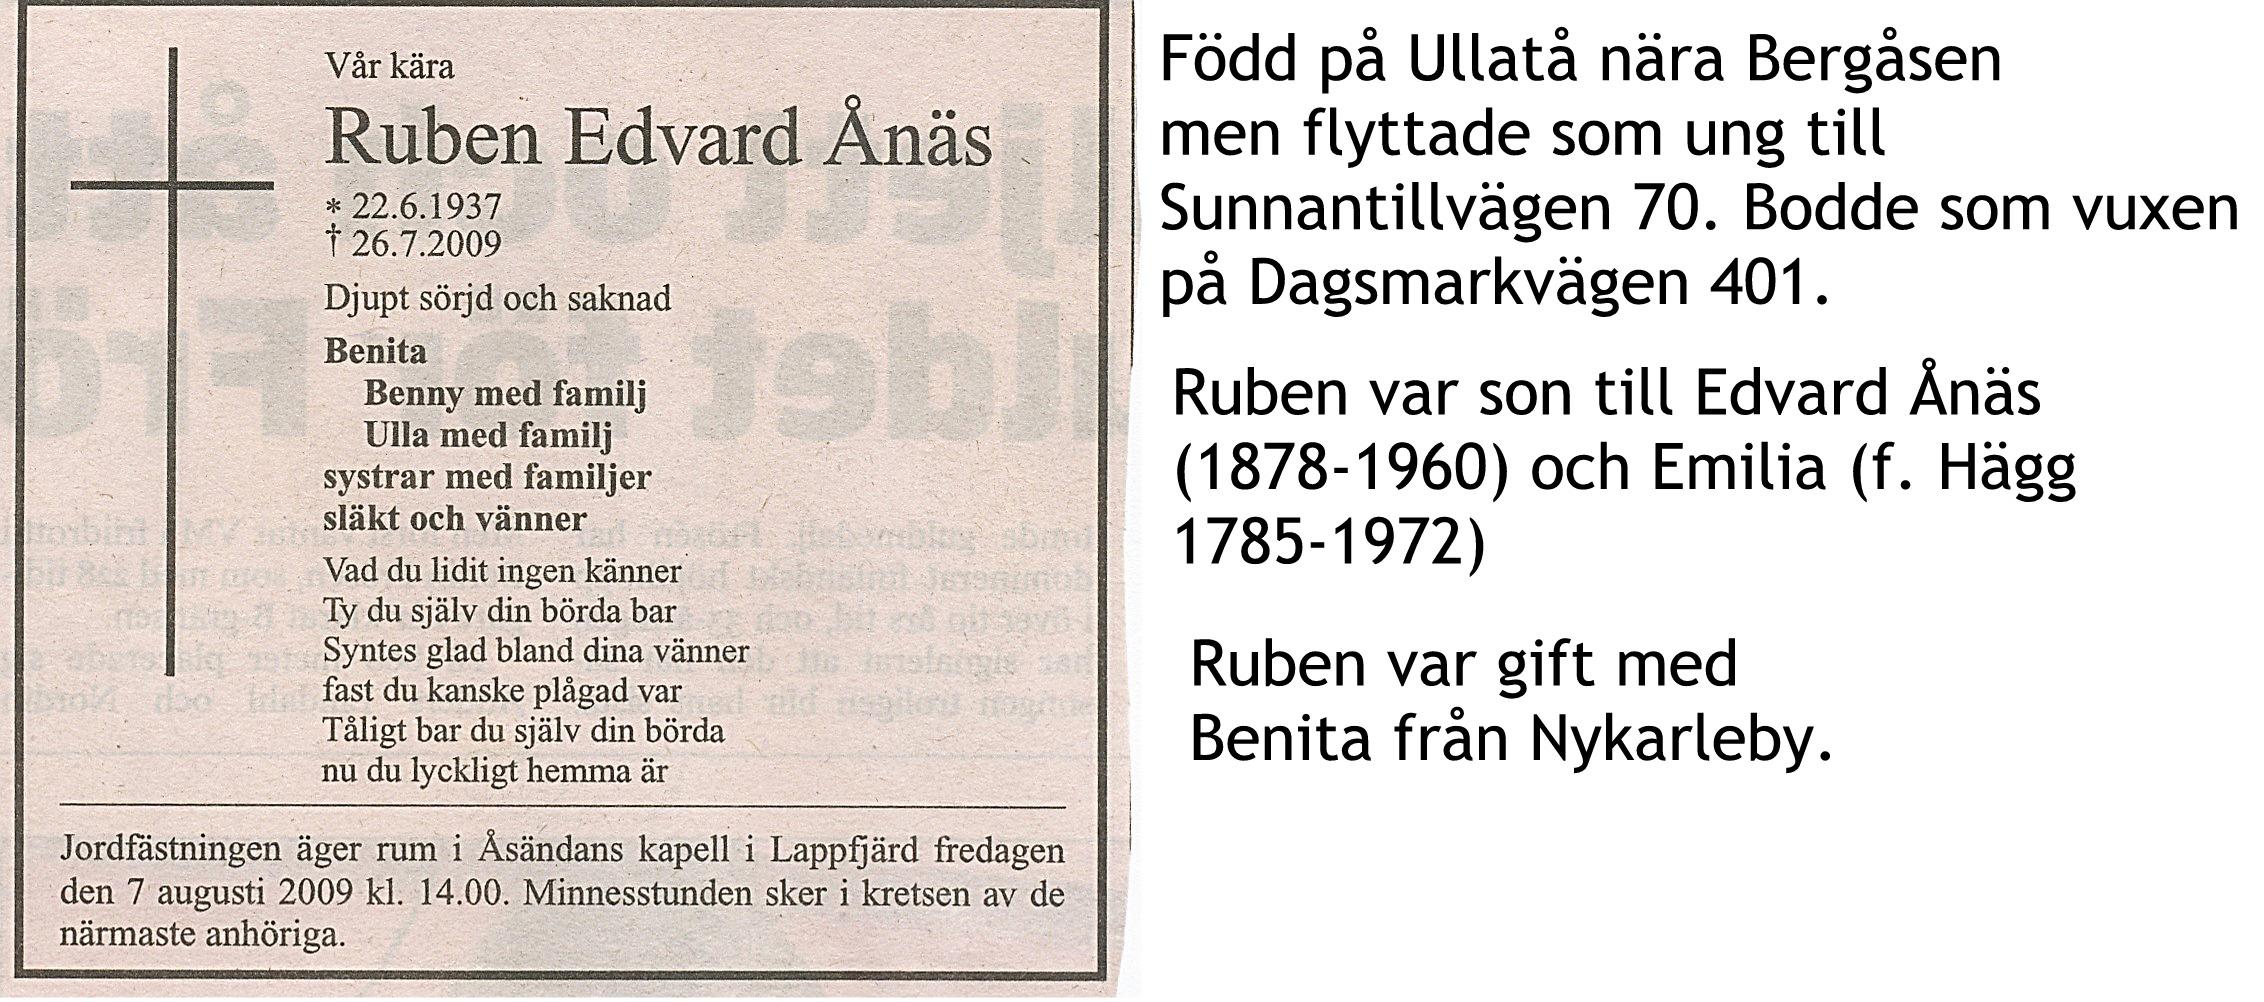 Ånäs Ruben Edvard